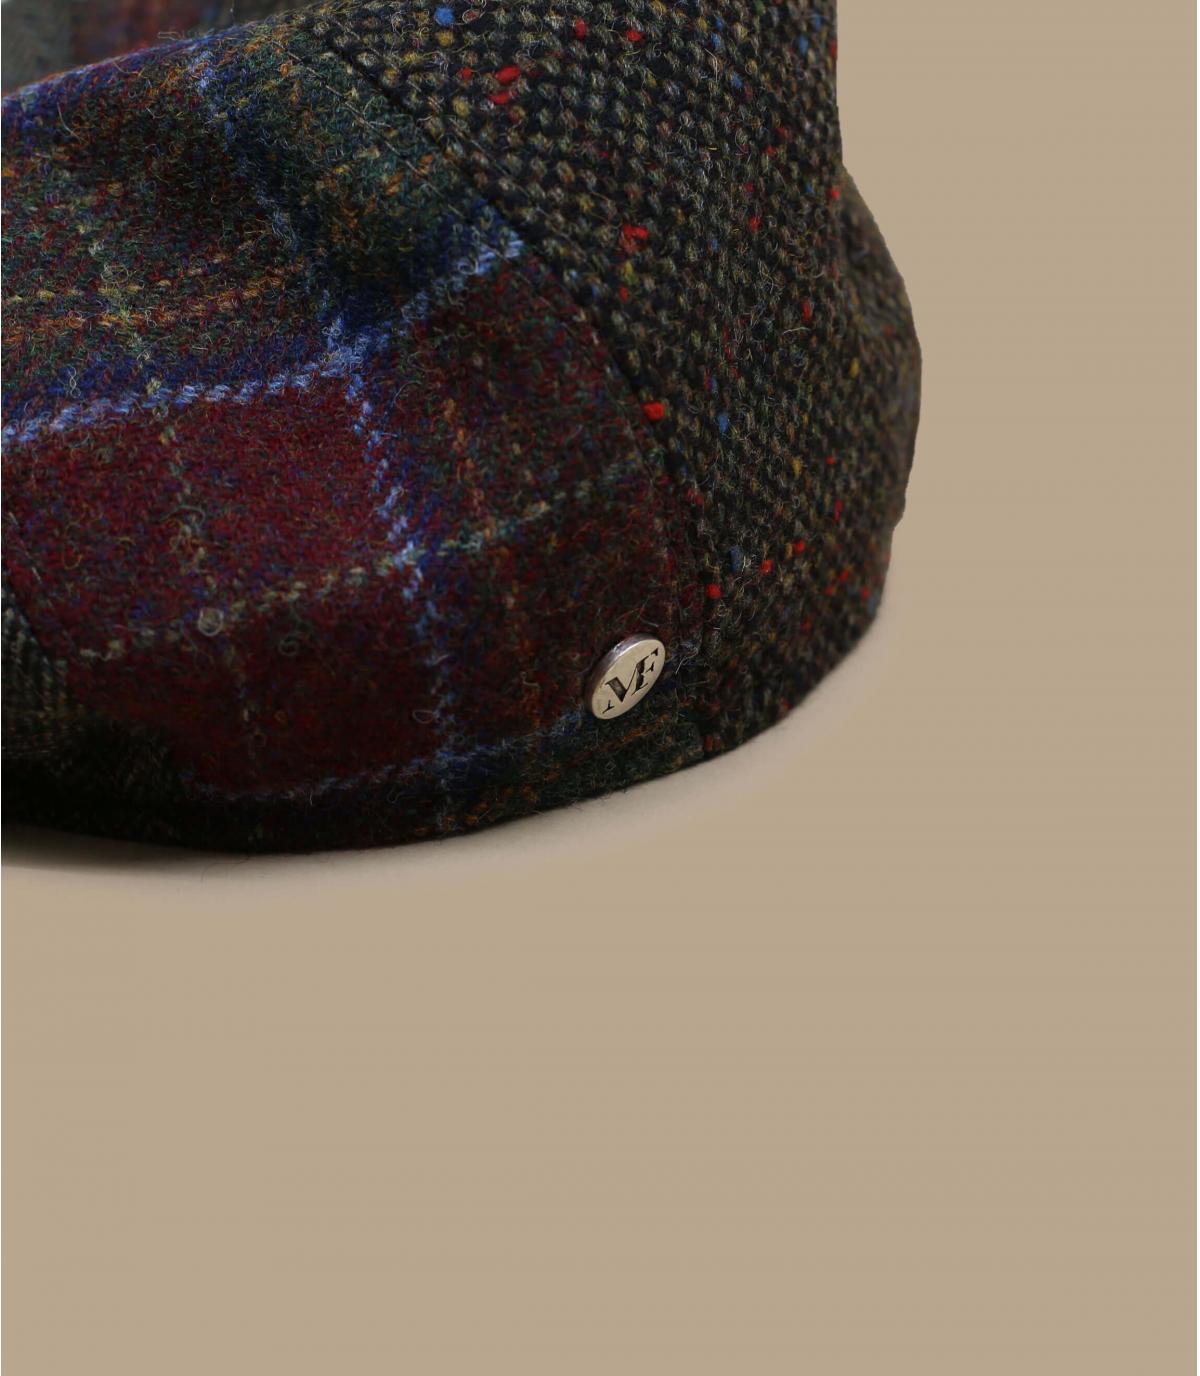 béret gavroche patchwork laine